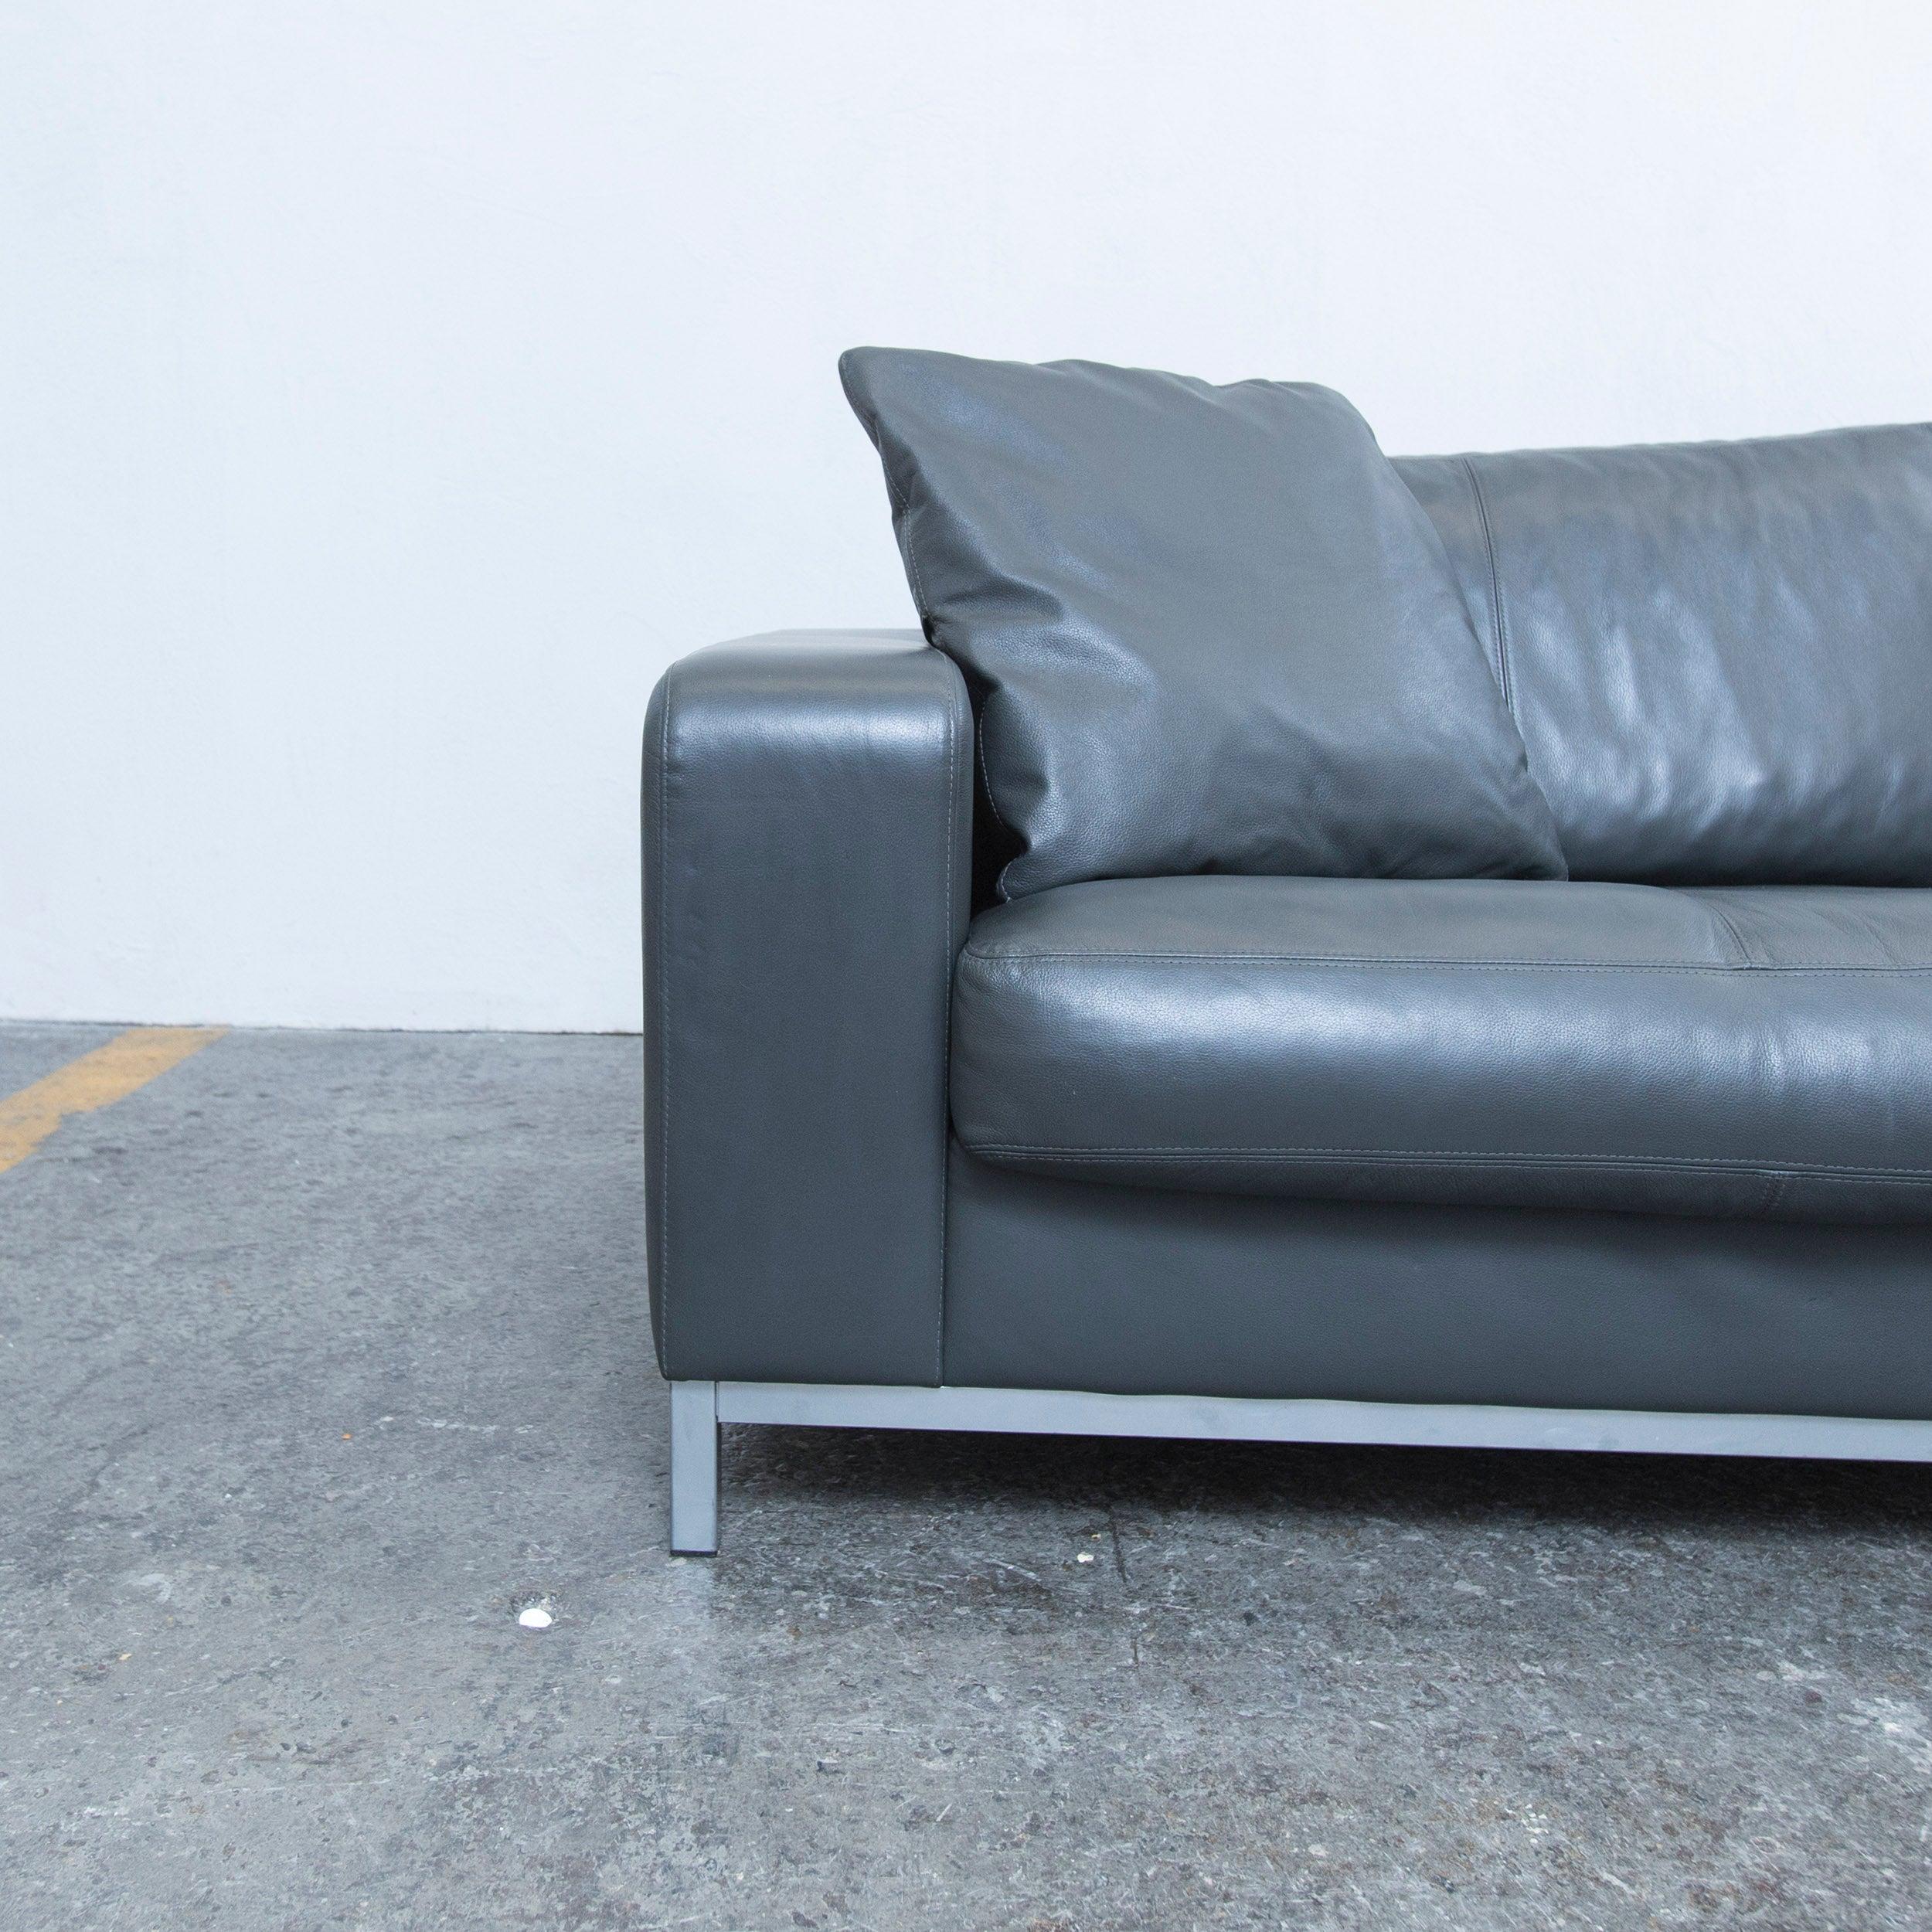 Gut Machalke Designer Sofa In Grey Leather Three Seat Couch, Modern At 1stdibs